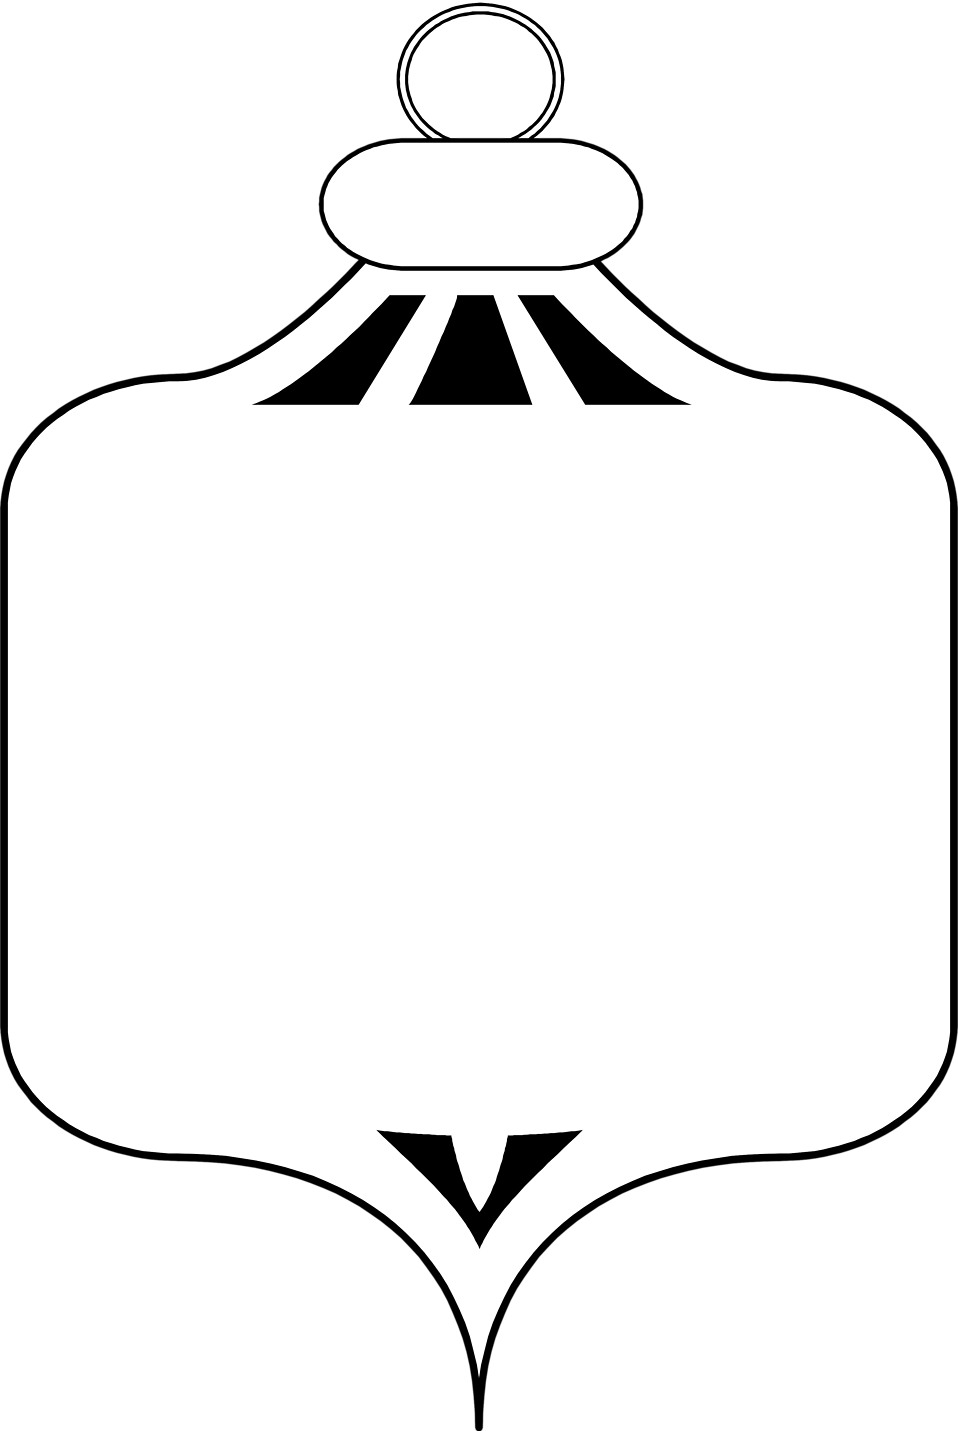 Ornament clipart line art. Free stock photo illustration